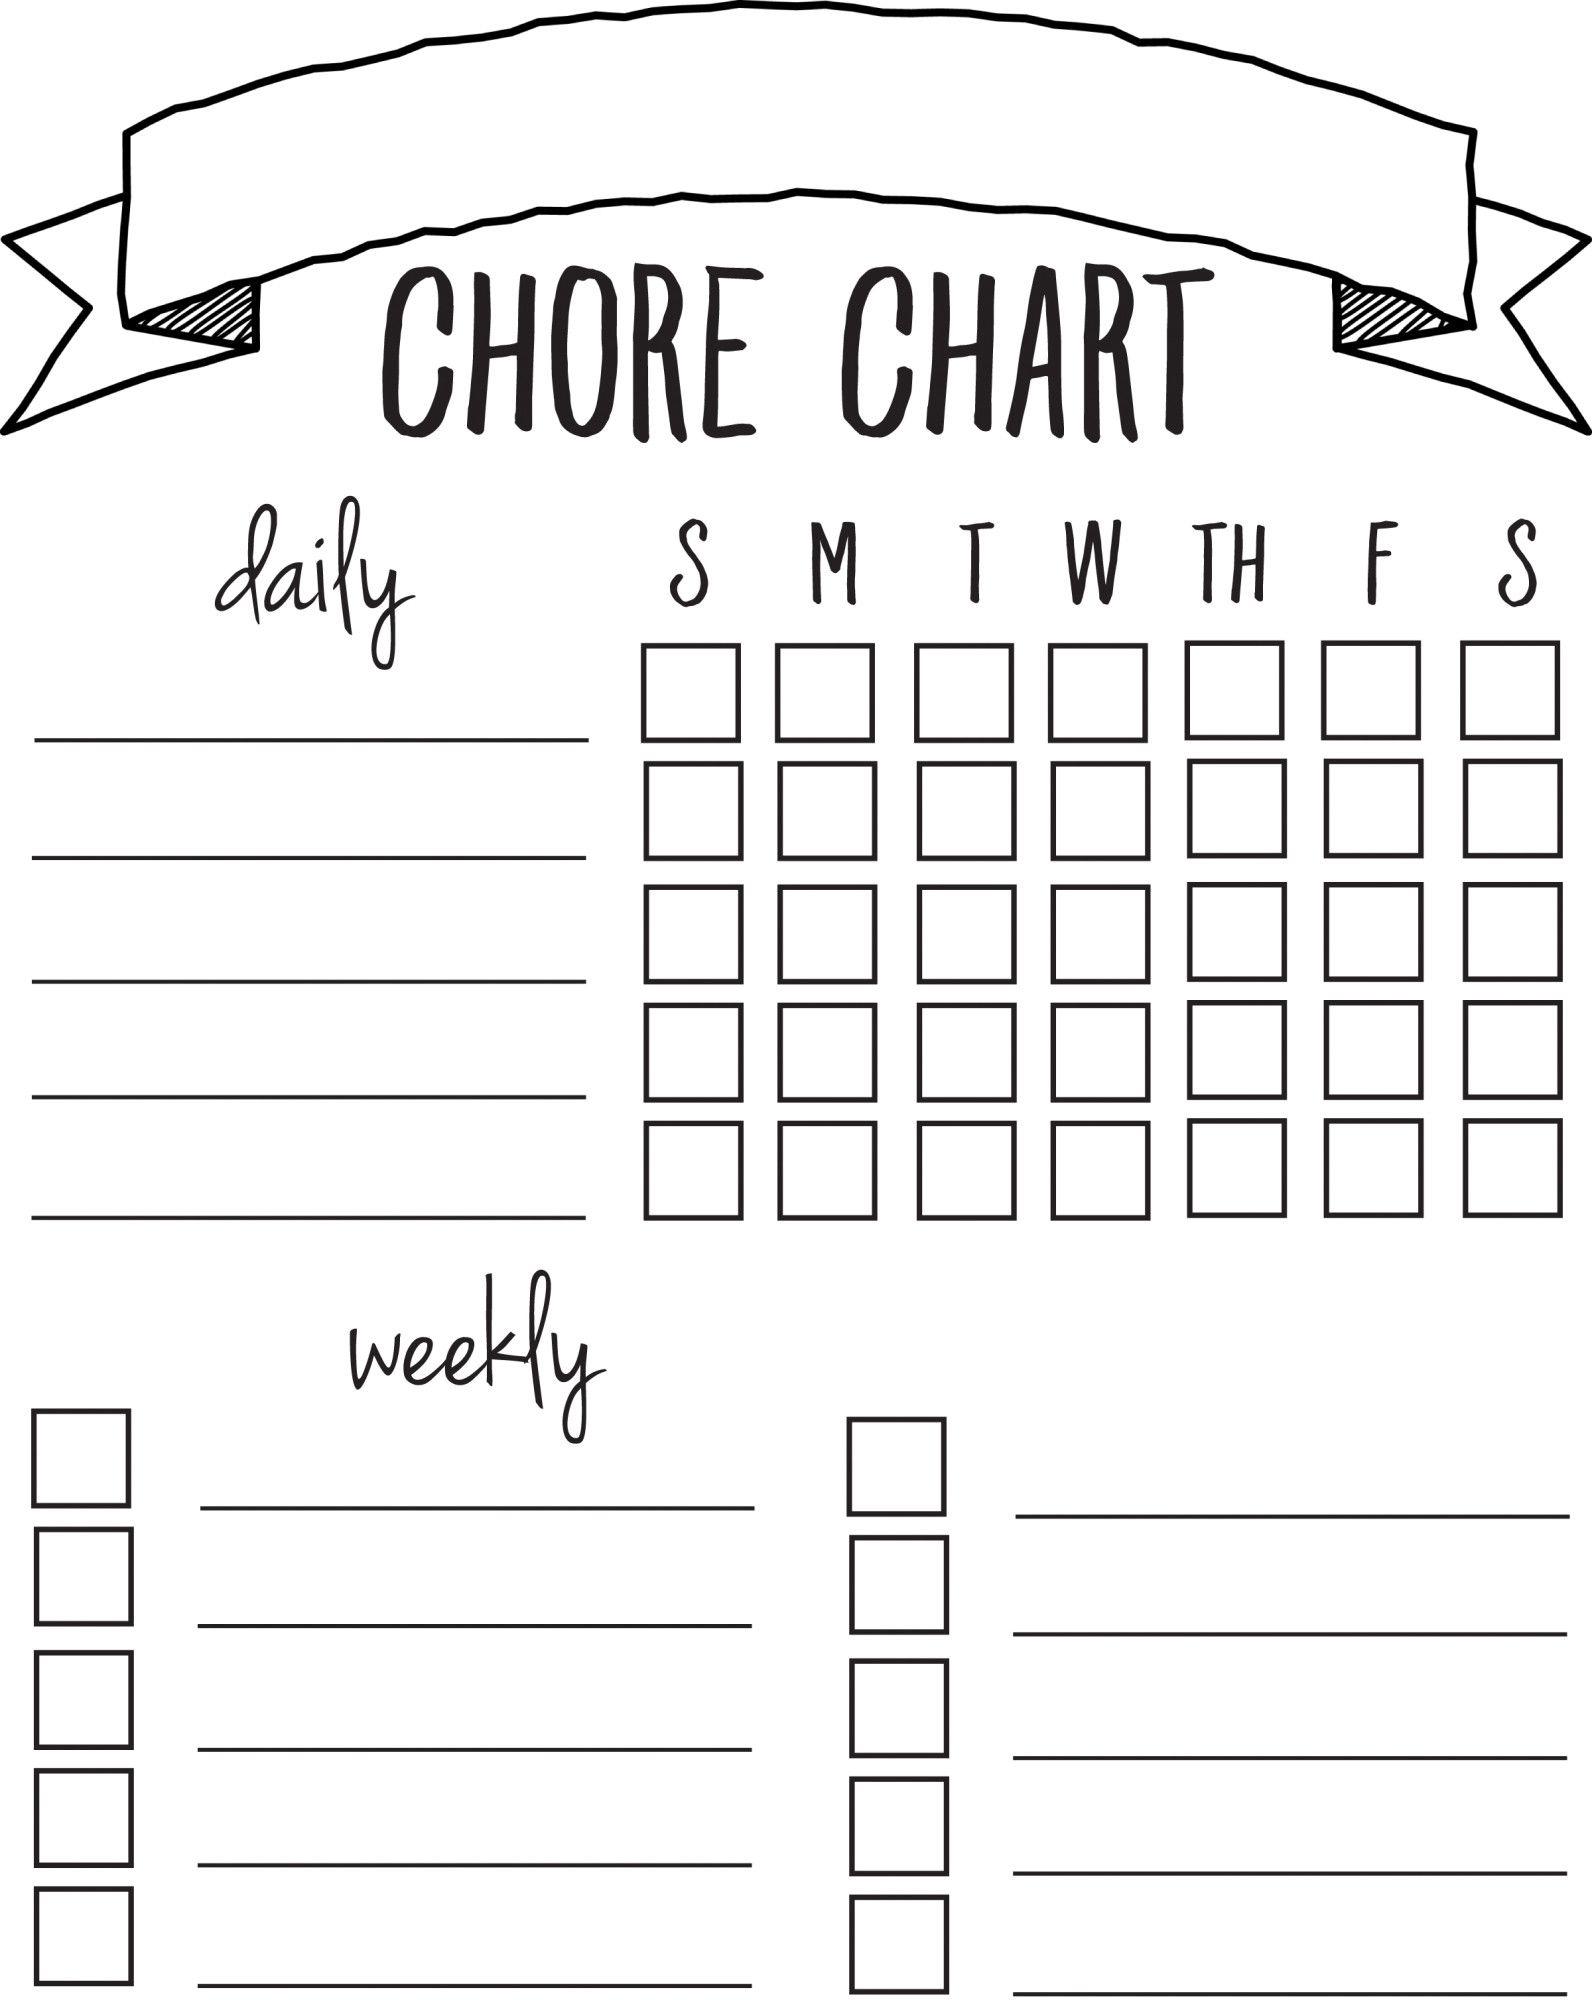 Diy Printable Chore Chart | Free Printables Nov/feb | Pinterest - Free Printable Charts And Lists